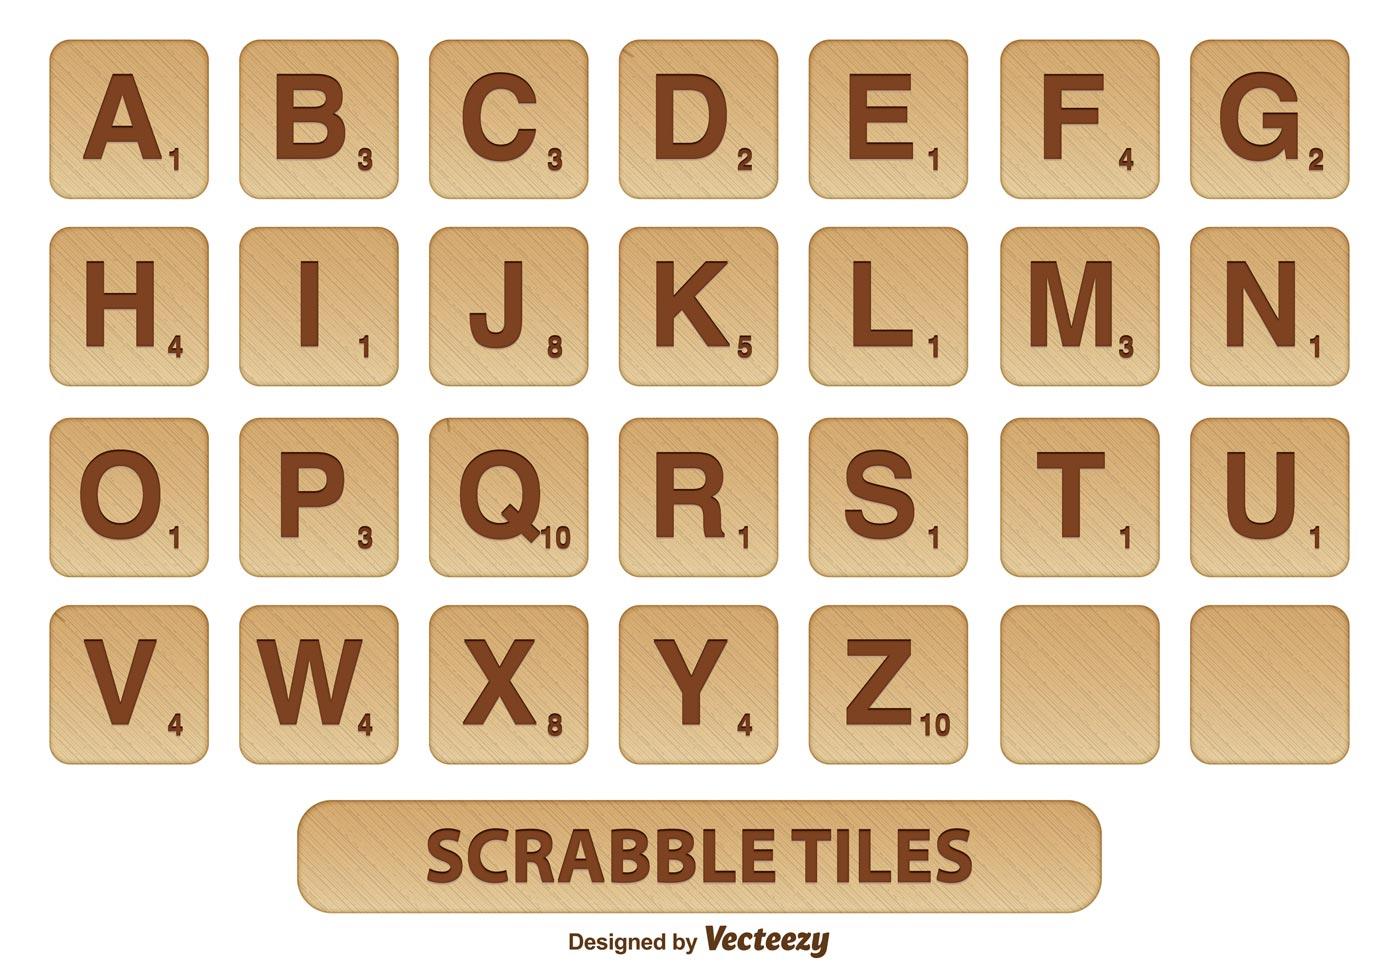 Scrabble Letter Tiles Set - Download Free Vector Art, Stock Graphics - Free Printable Scrabble Tiles